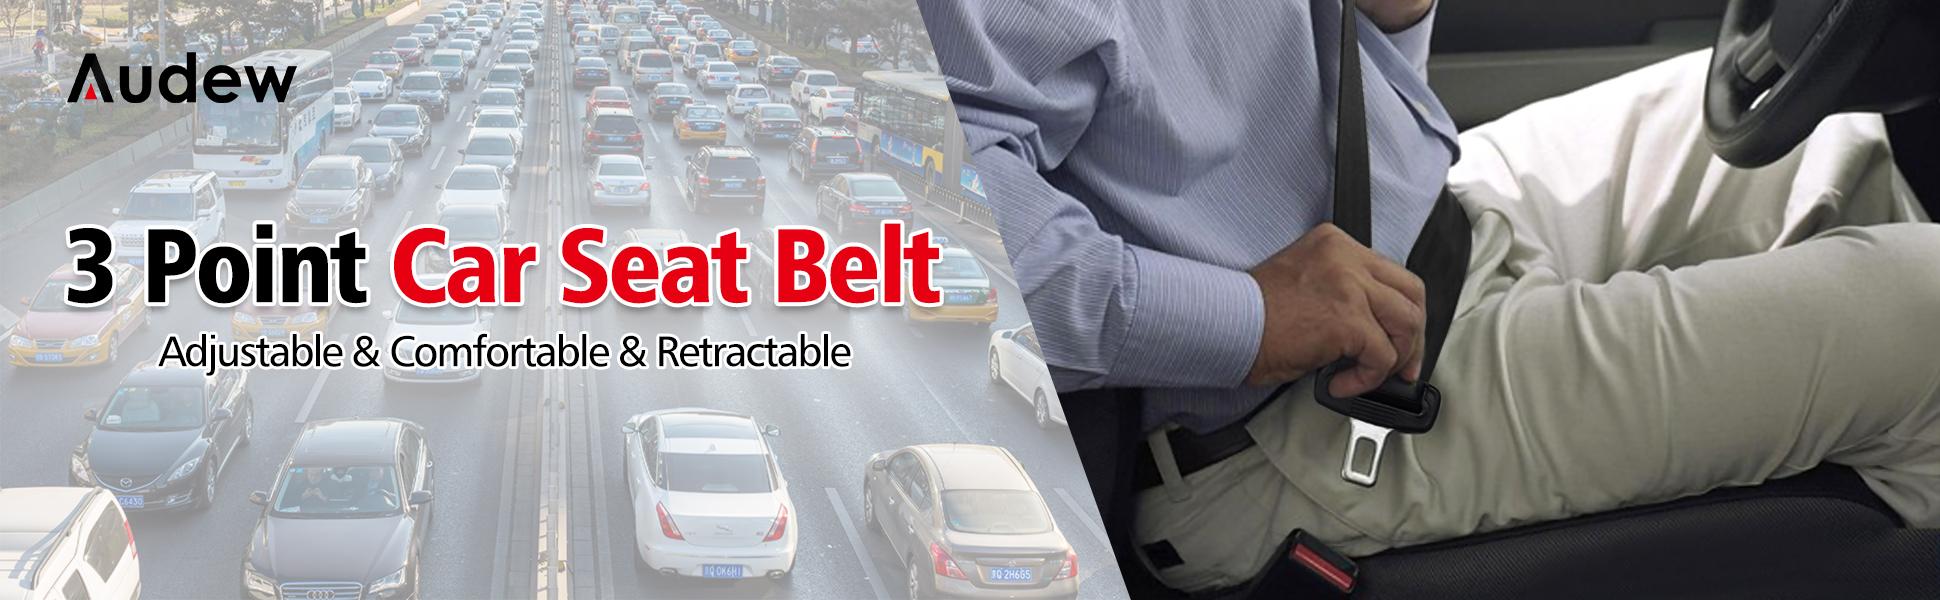 Hzs General Purpose Three-Point Seat Belt Truck Passenger car Side Insert Three-Point Seat Belt car Seat Belt Driver Seat Belt